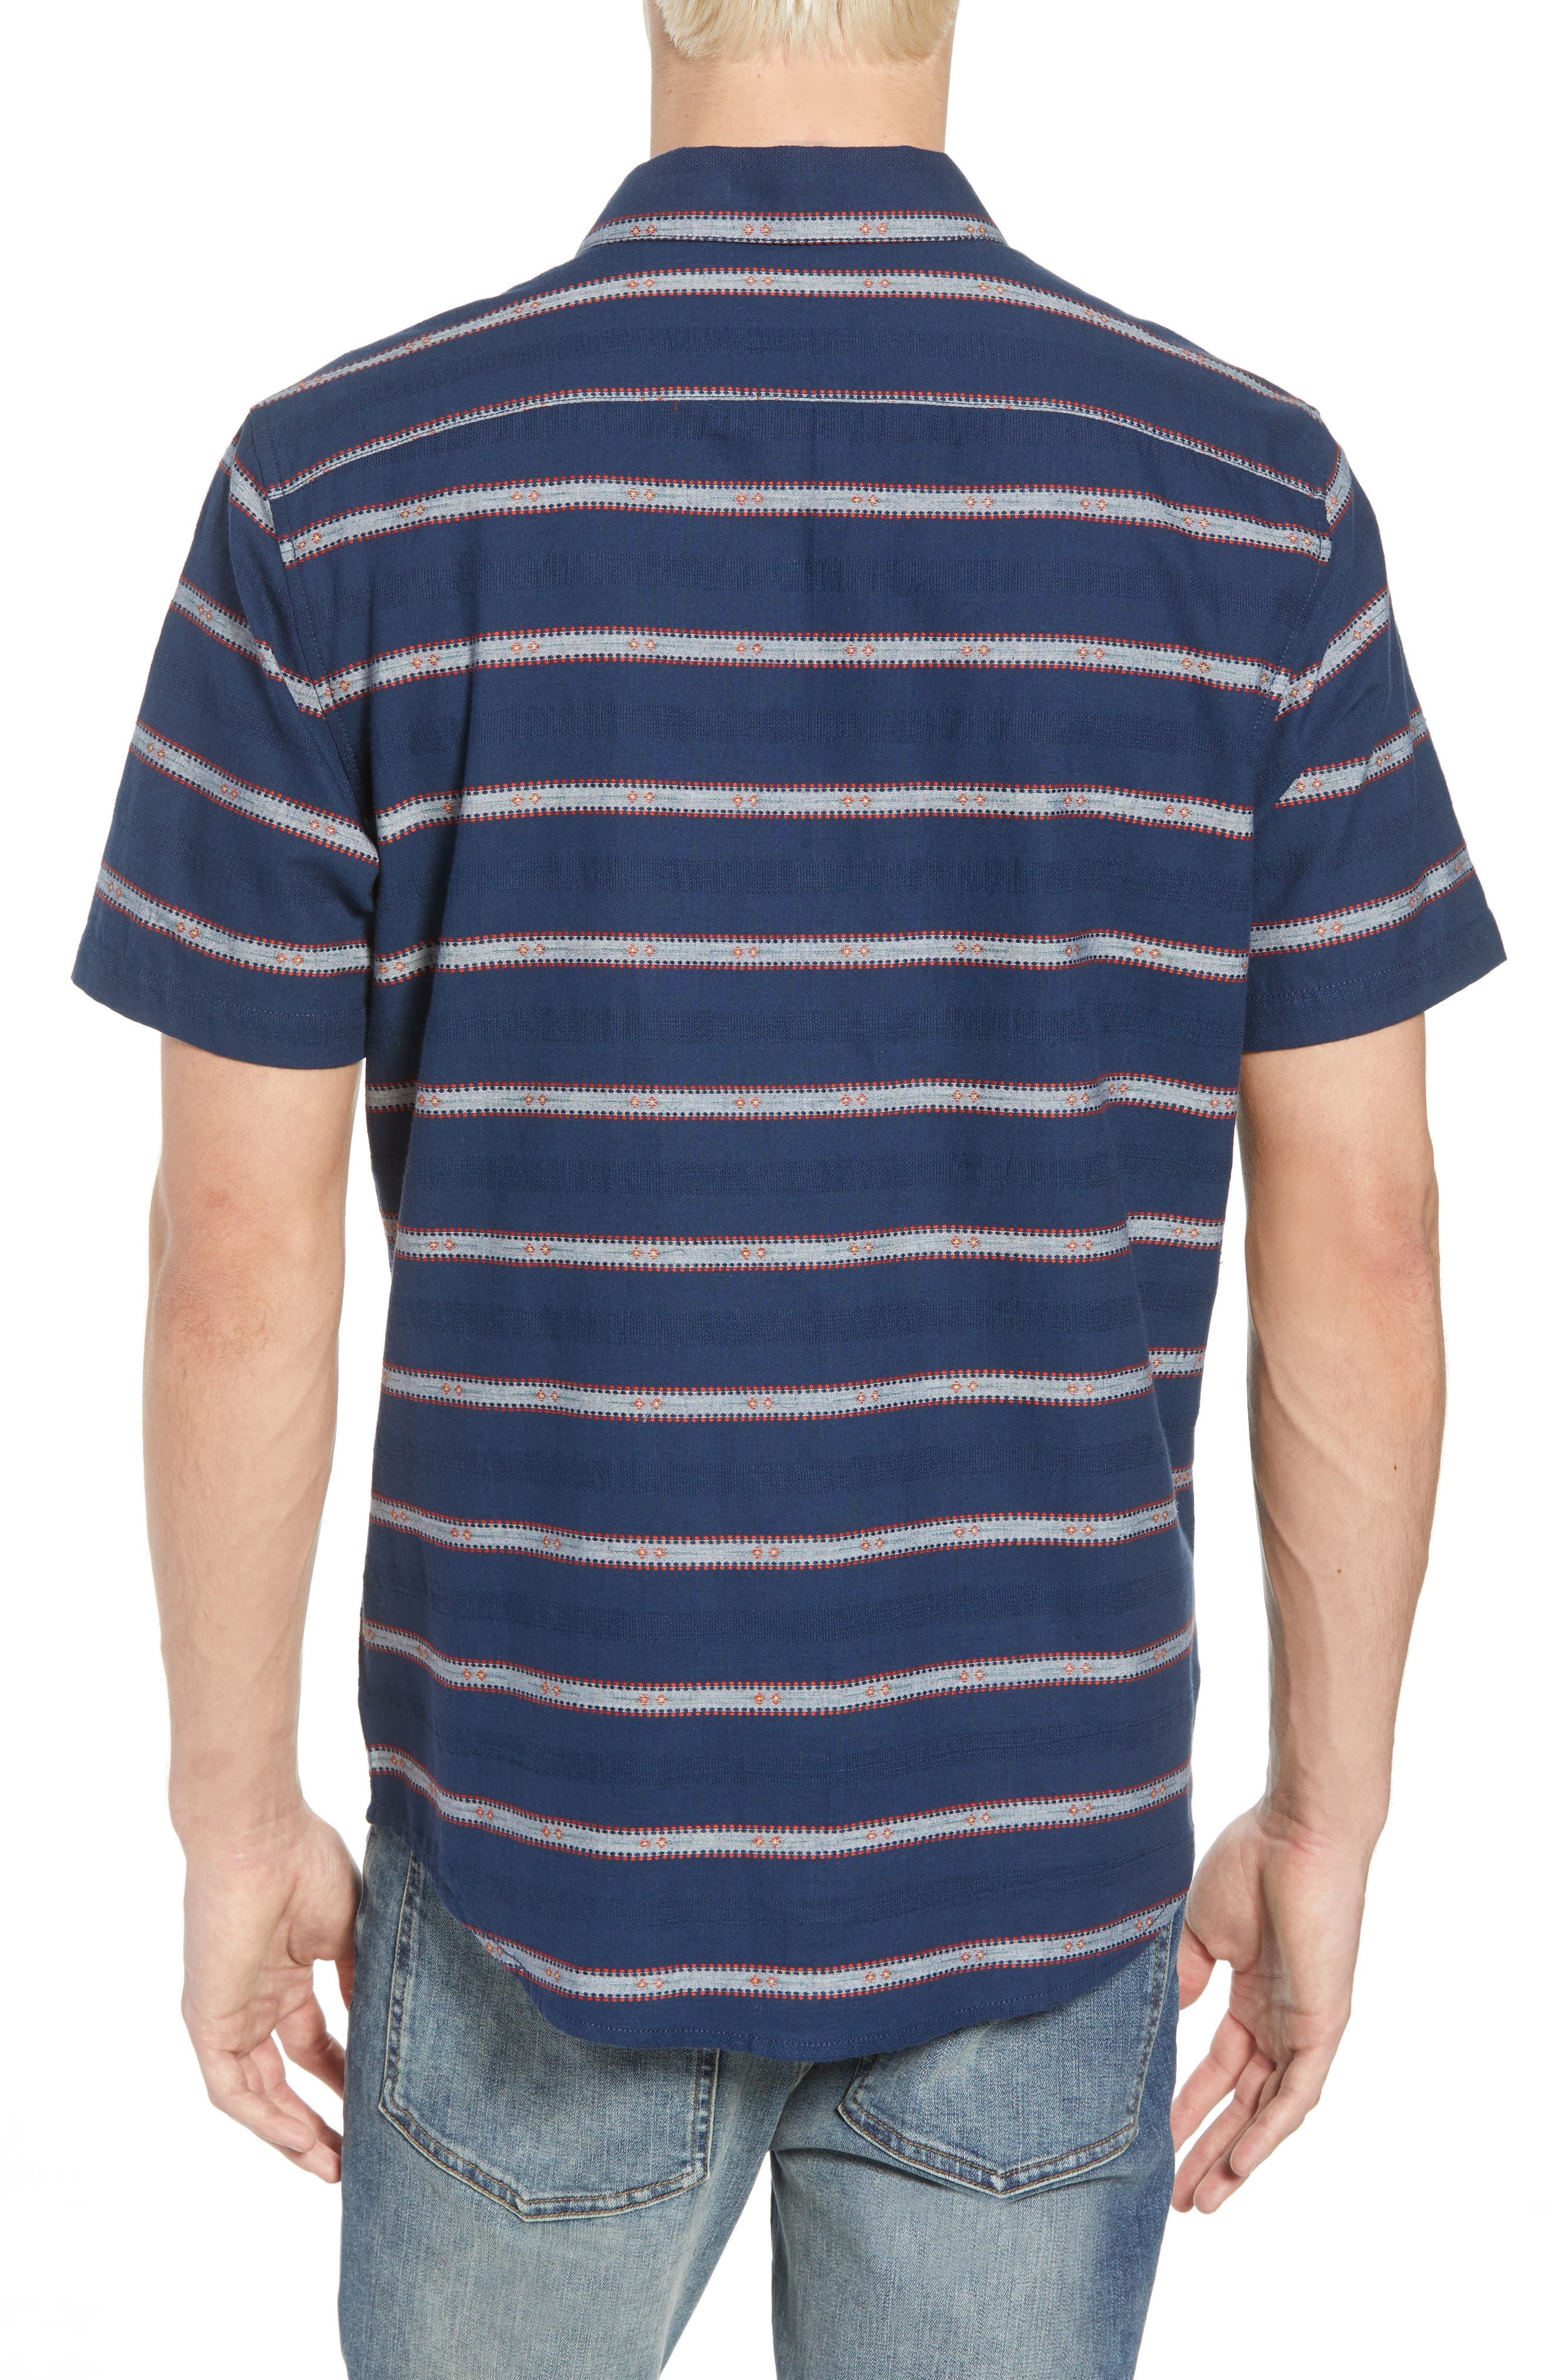 Outer Sunset Woven Shirt,                             Alternate thumbnail 2, color,                             SEATTLE BLUE